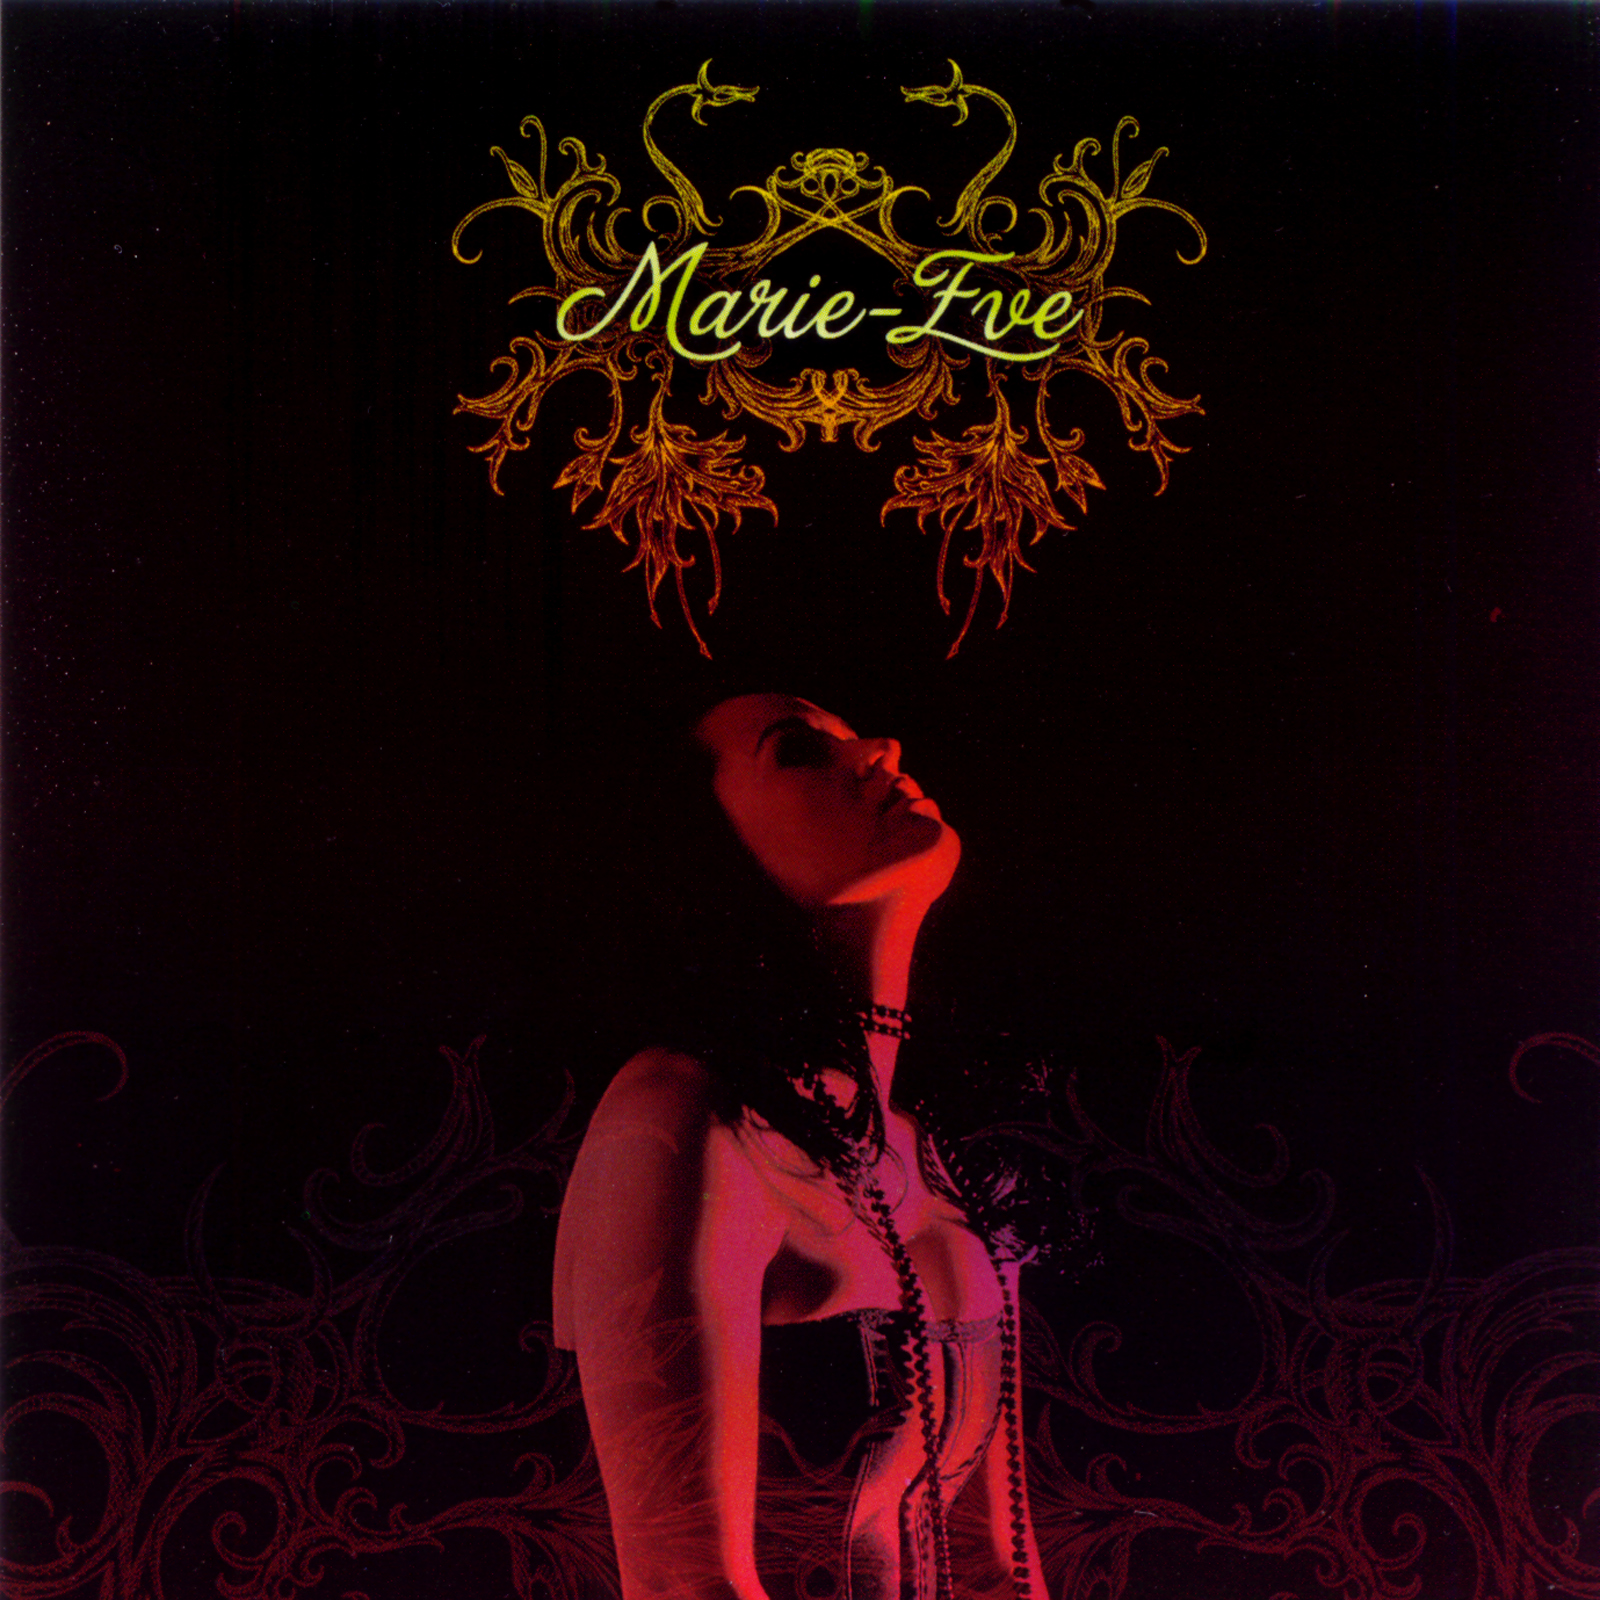 Marie- Eve – Presente